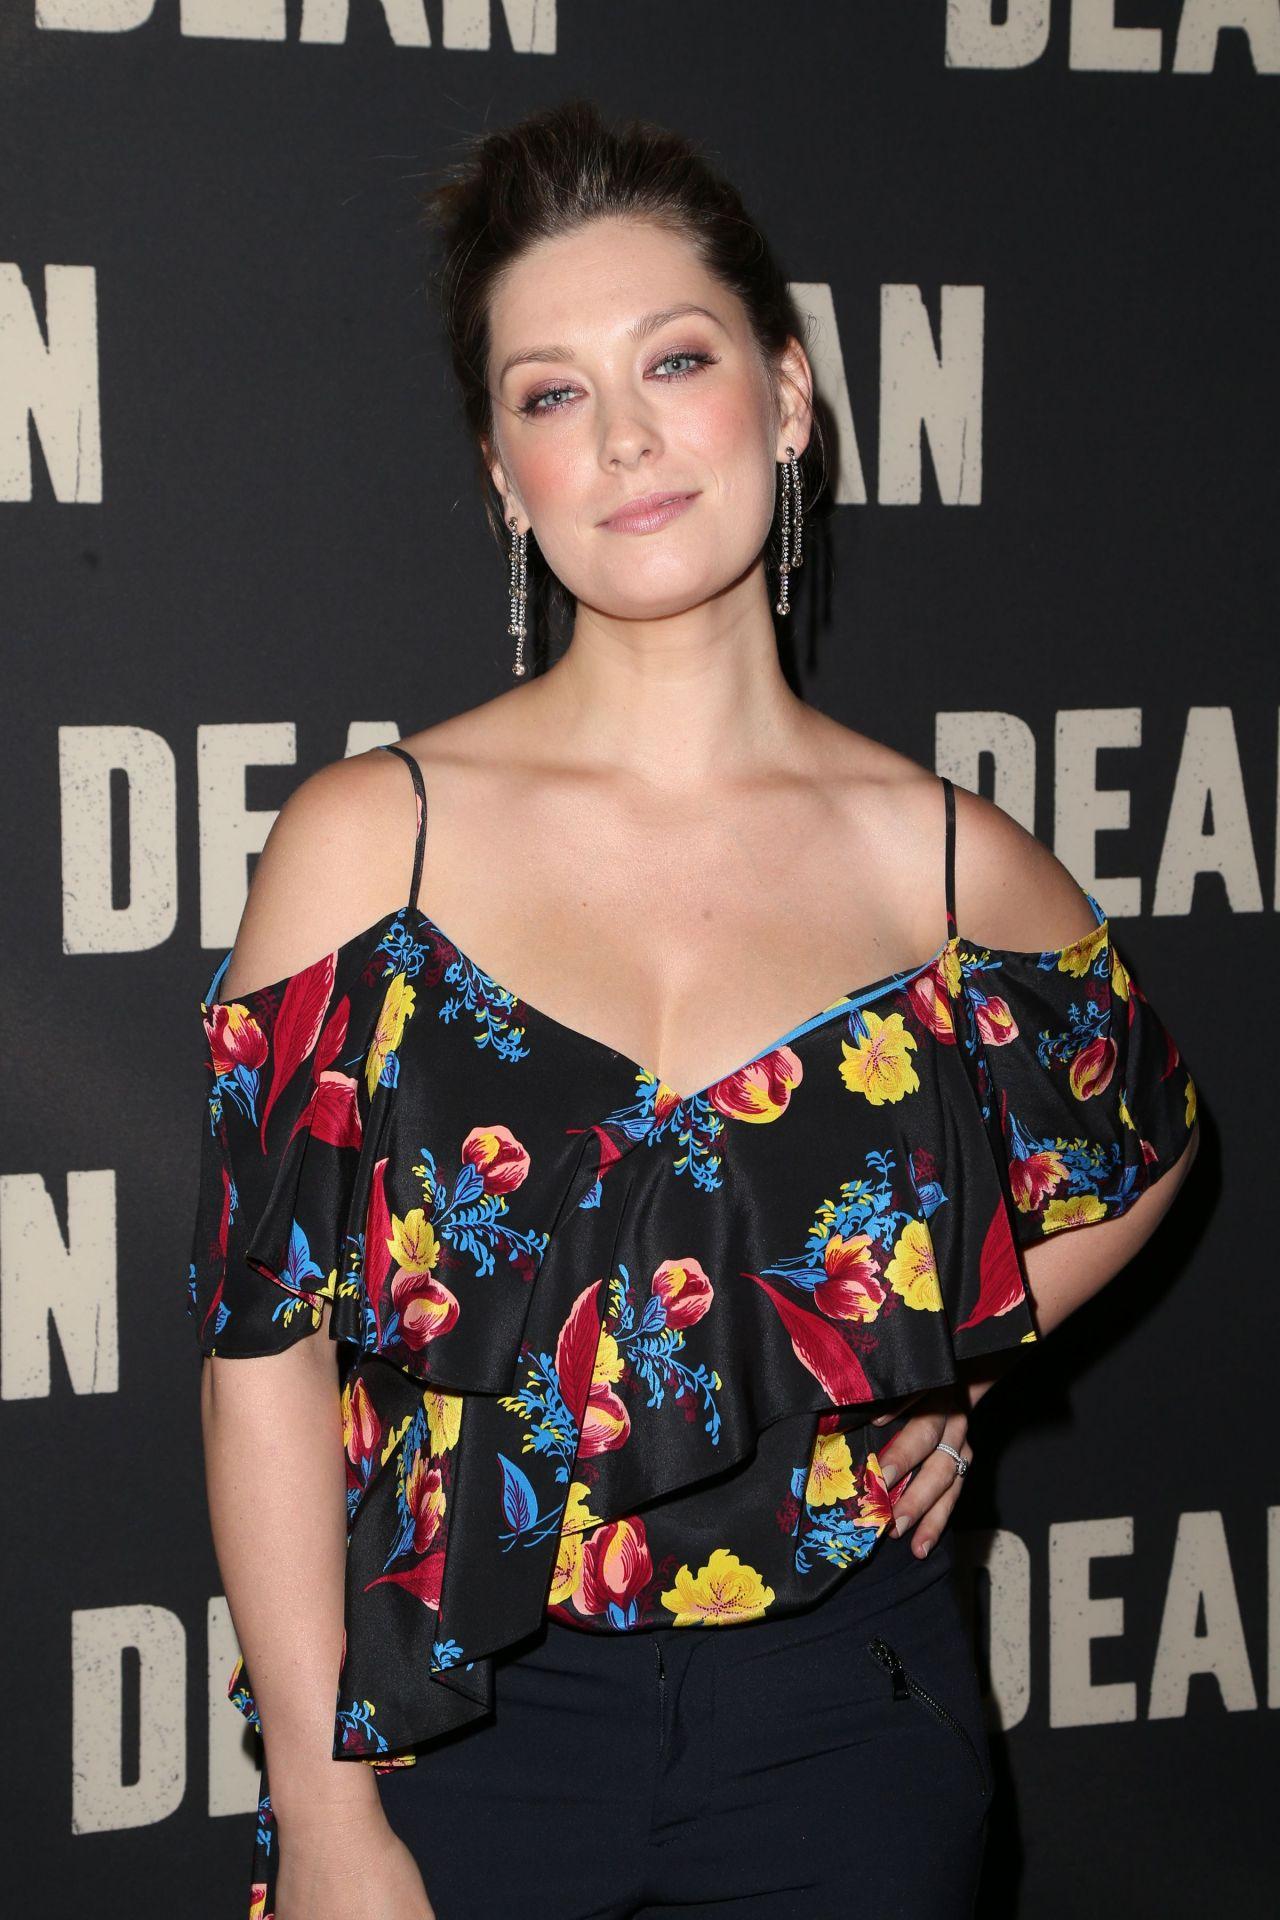 Briga Heelan Dean Special Screening In Hollywood 05 24